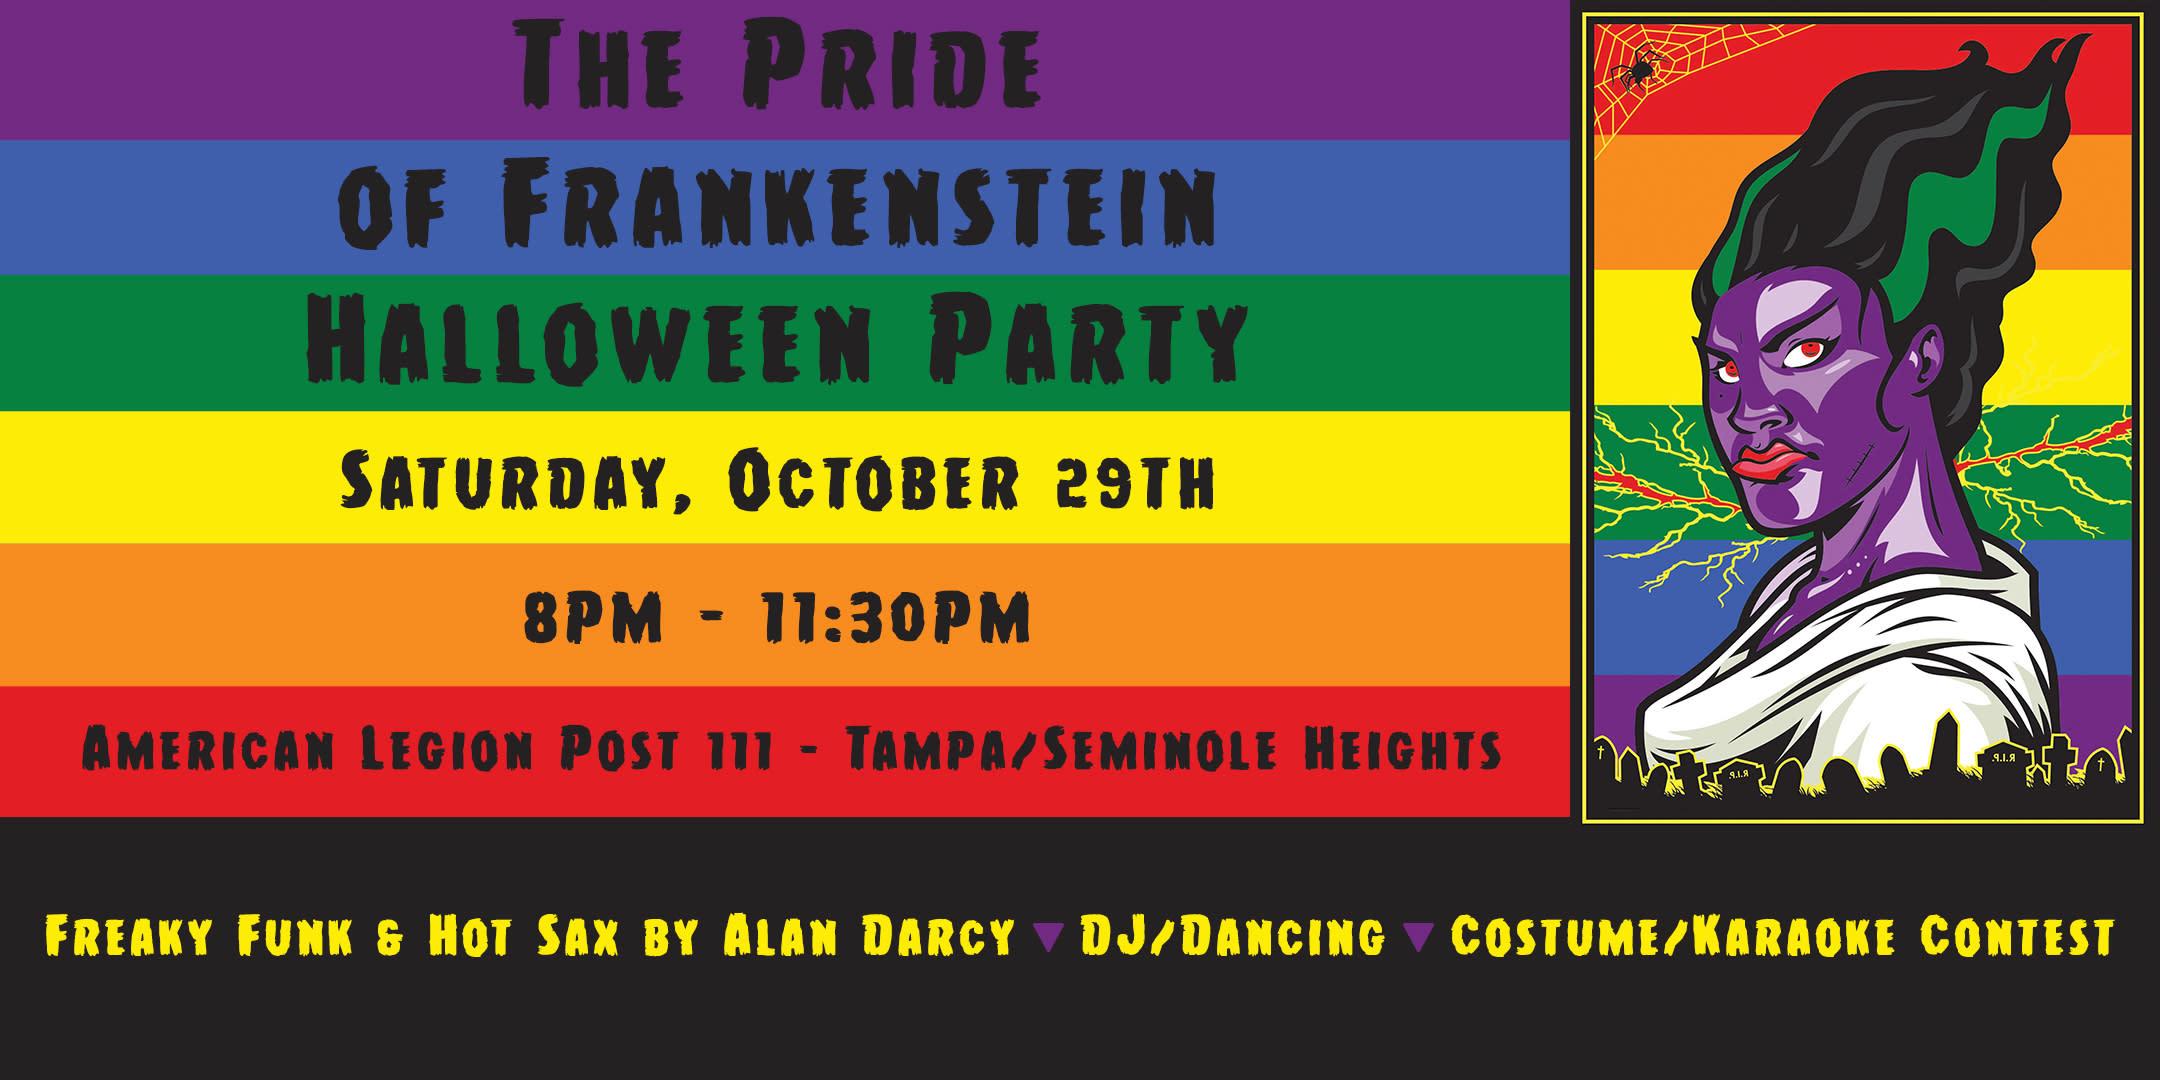 The Pride of Frankenstein Halloween Party